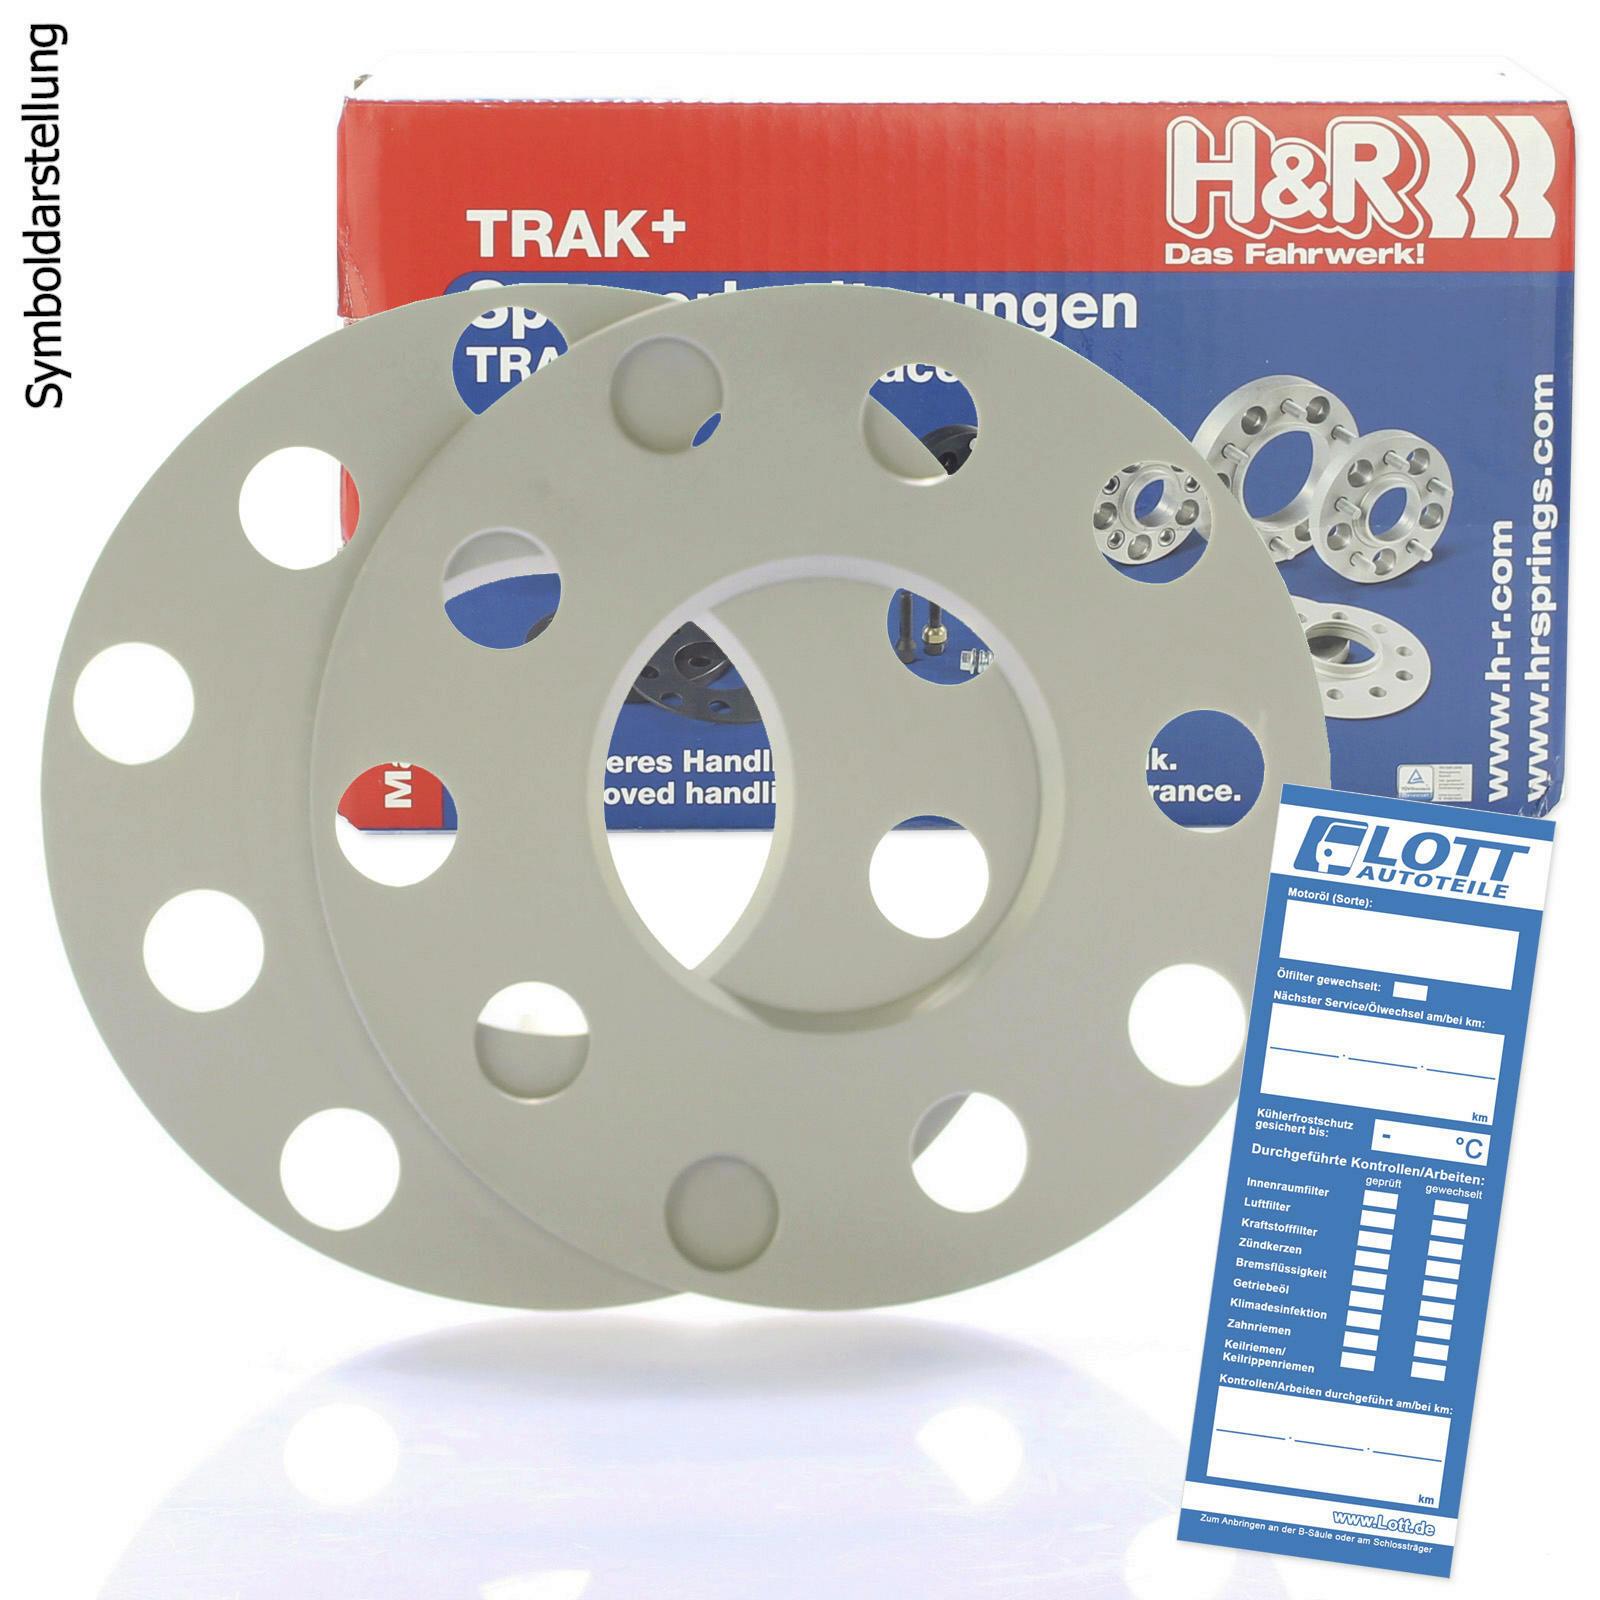 H&R DR Spurplatten Spurverbreiterung Distanzscheibe 5x112 16mm // 2x8mm